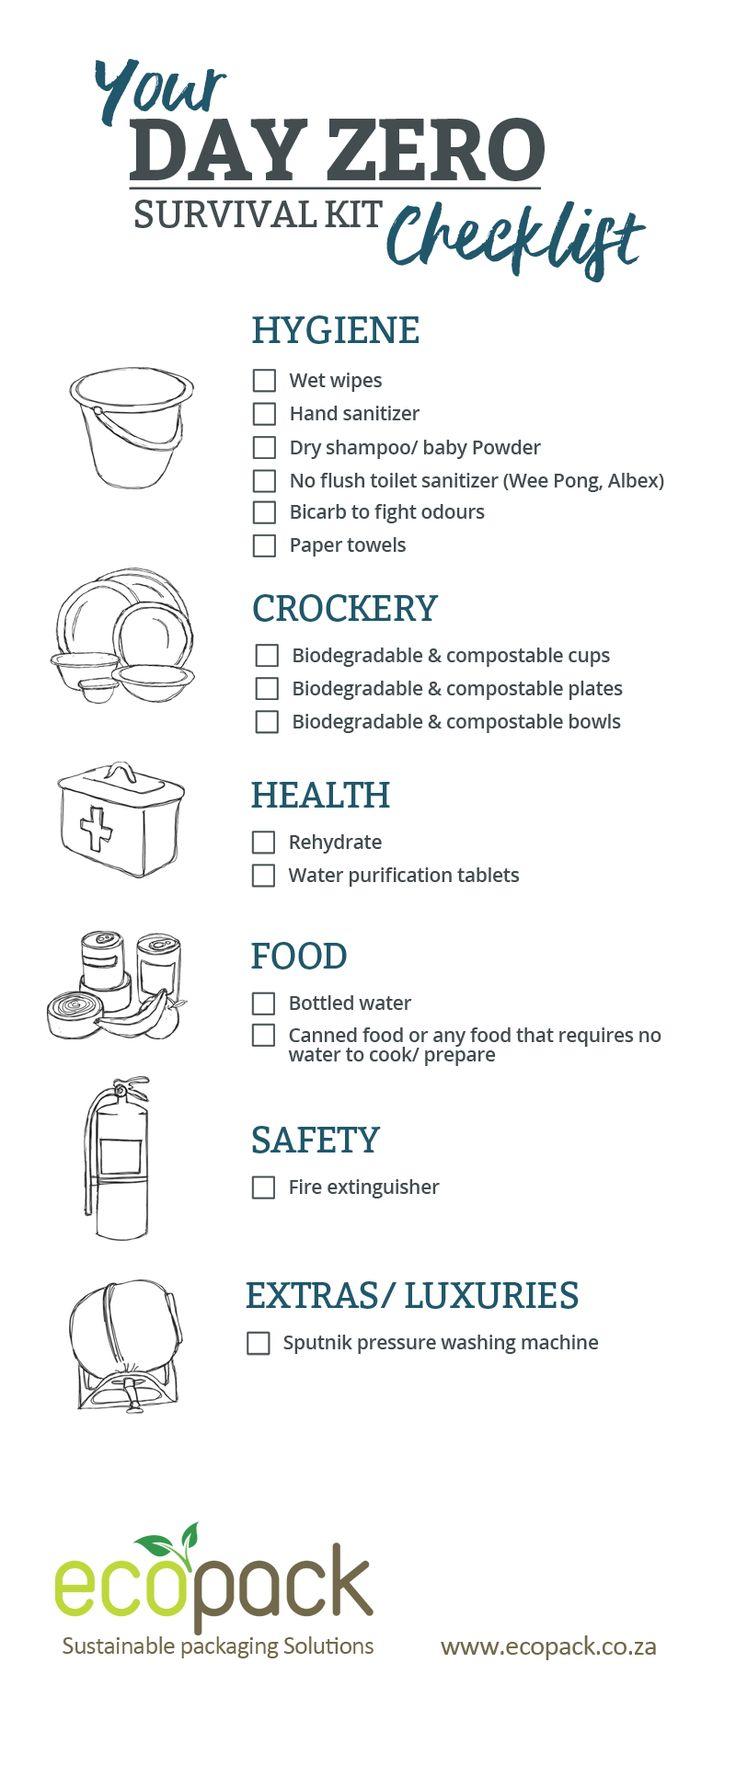 Your Day Zero Survival Kit Checklist